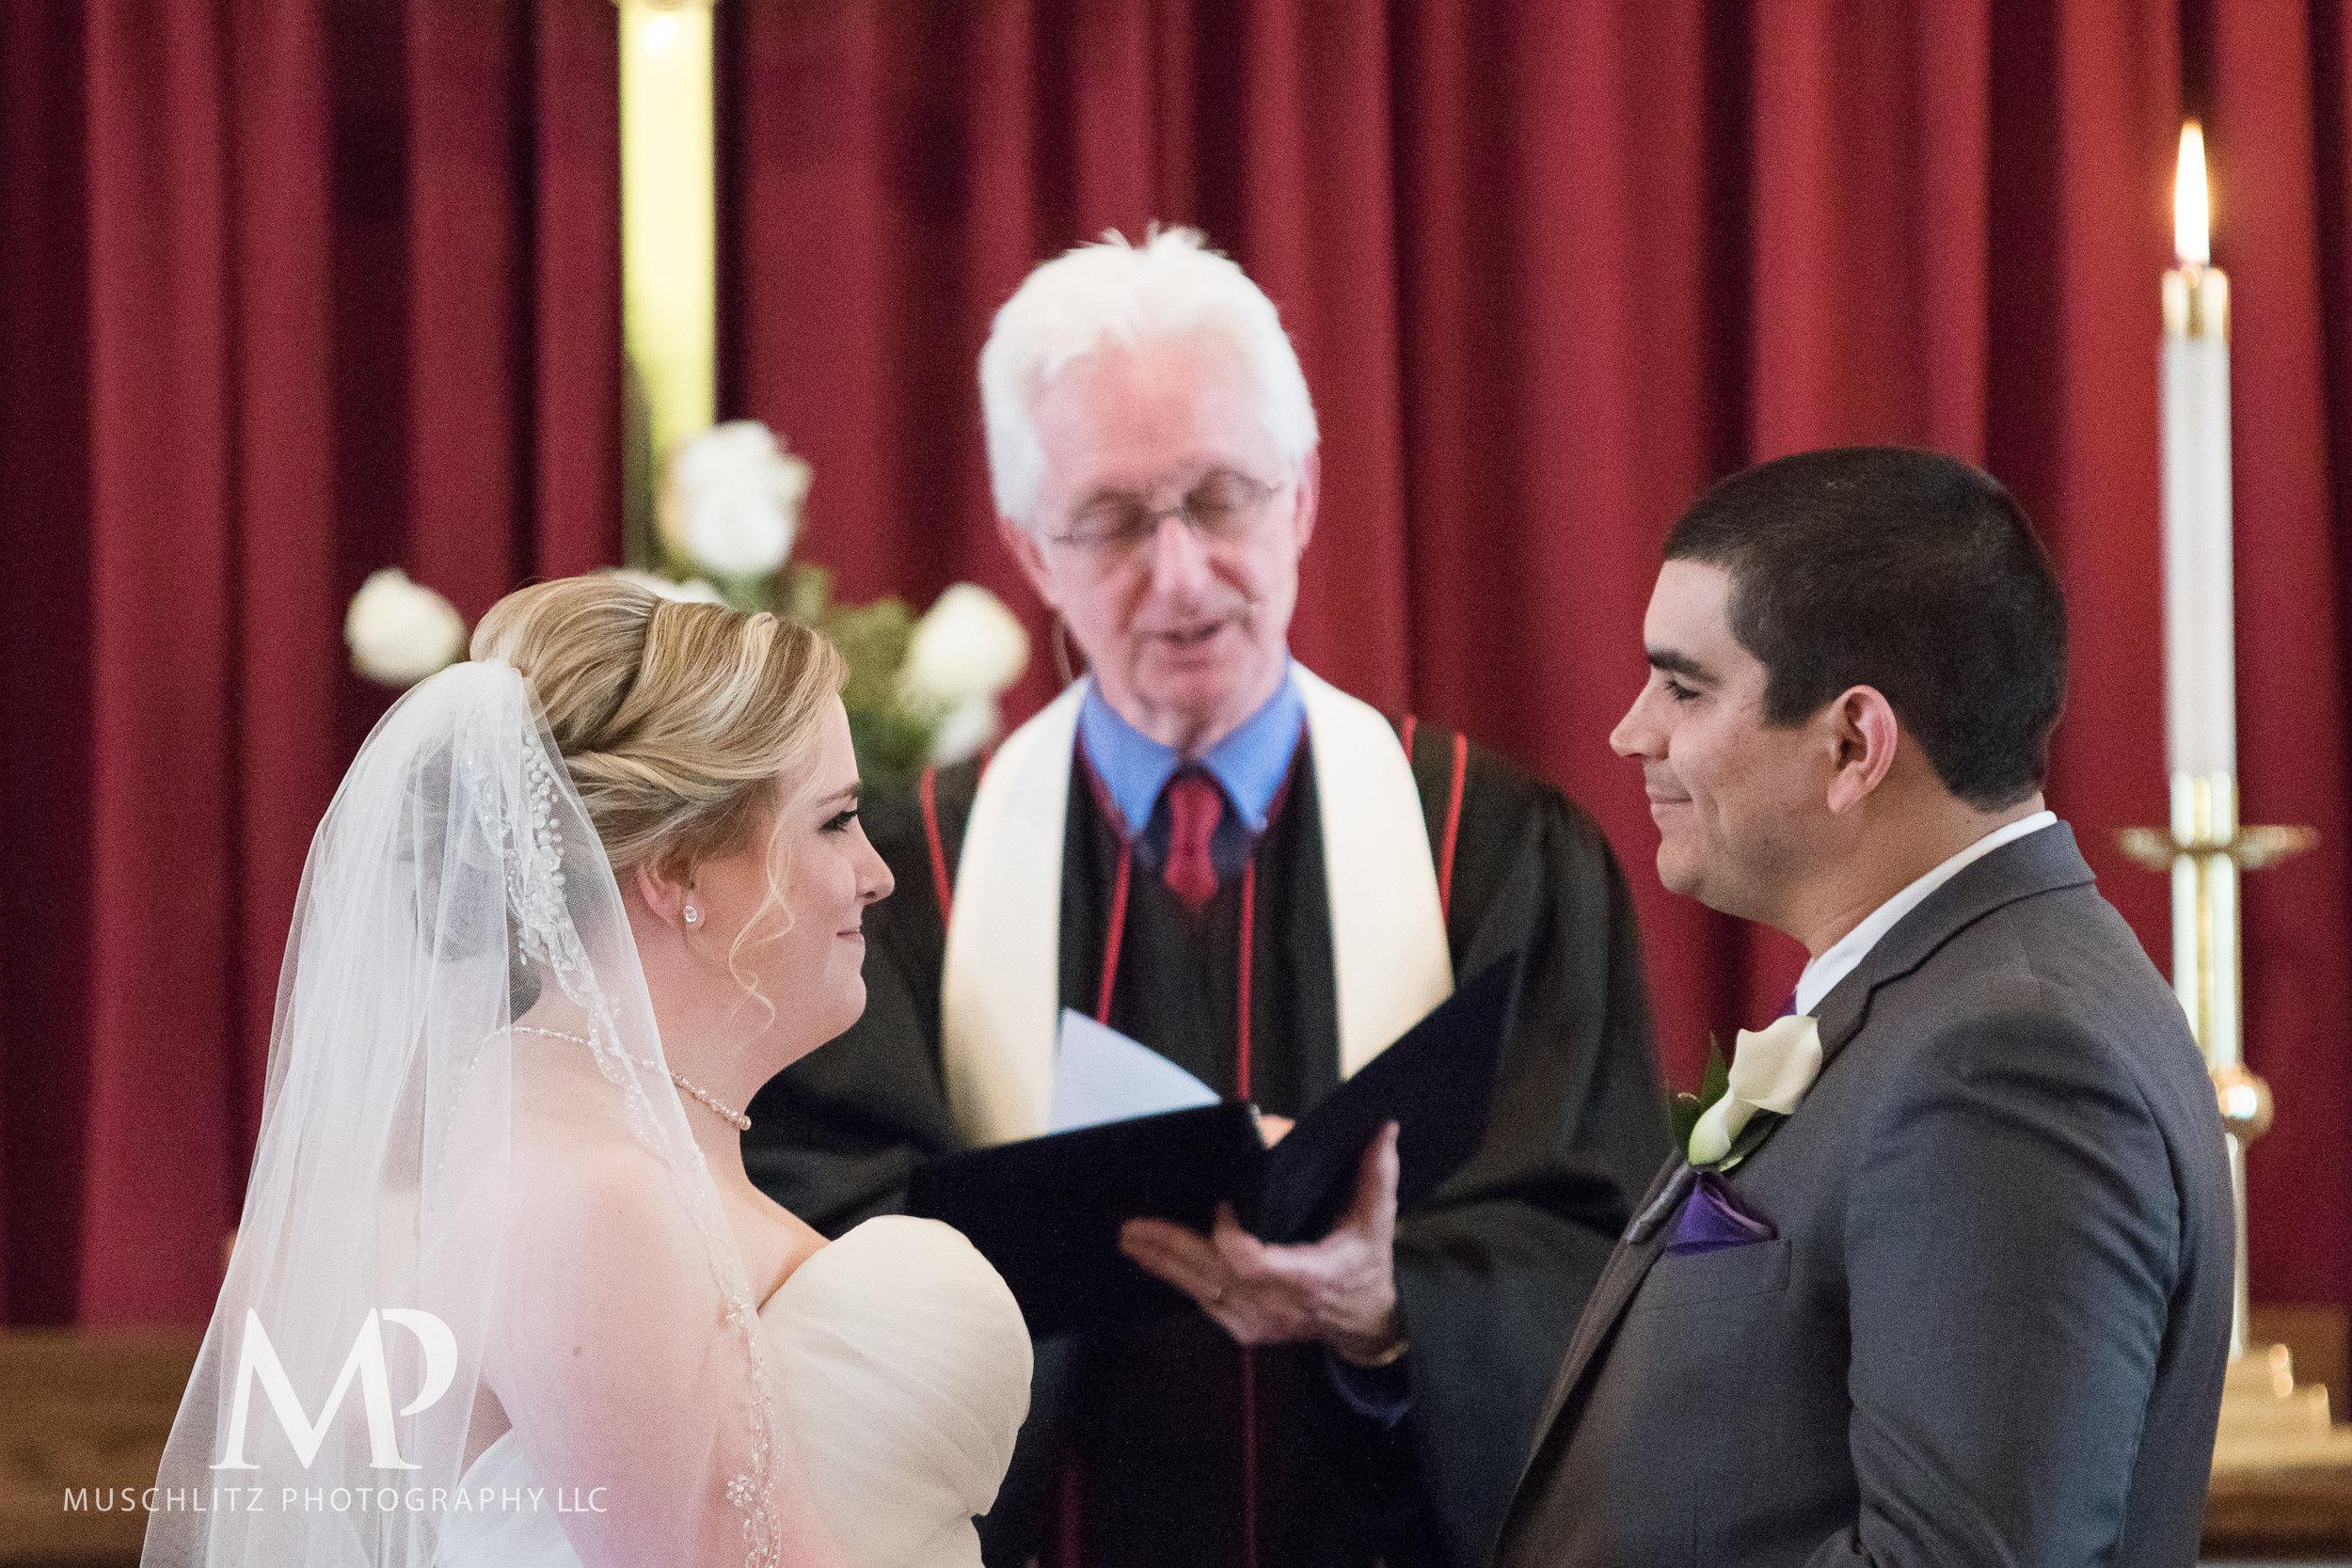 dublin-community-church-wedding-columbus-ohio-muschlitz-photography-048.JPG